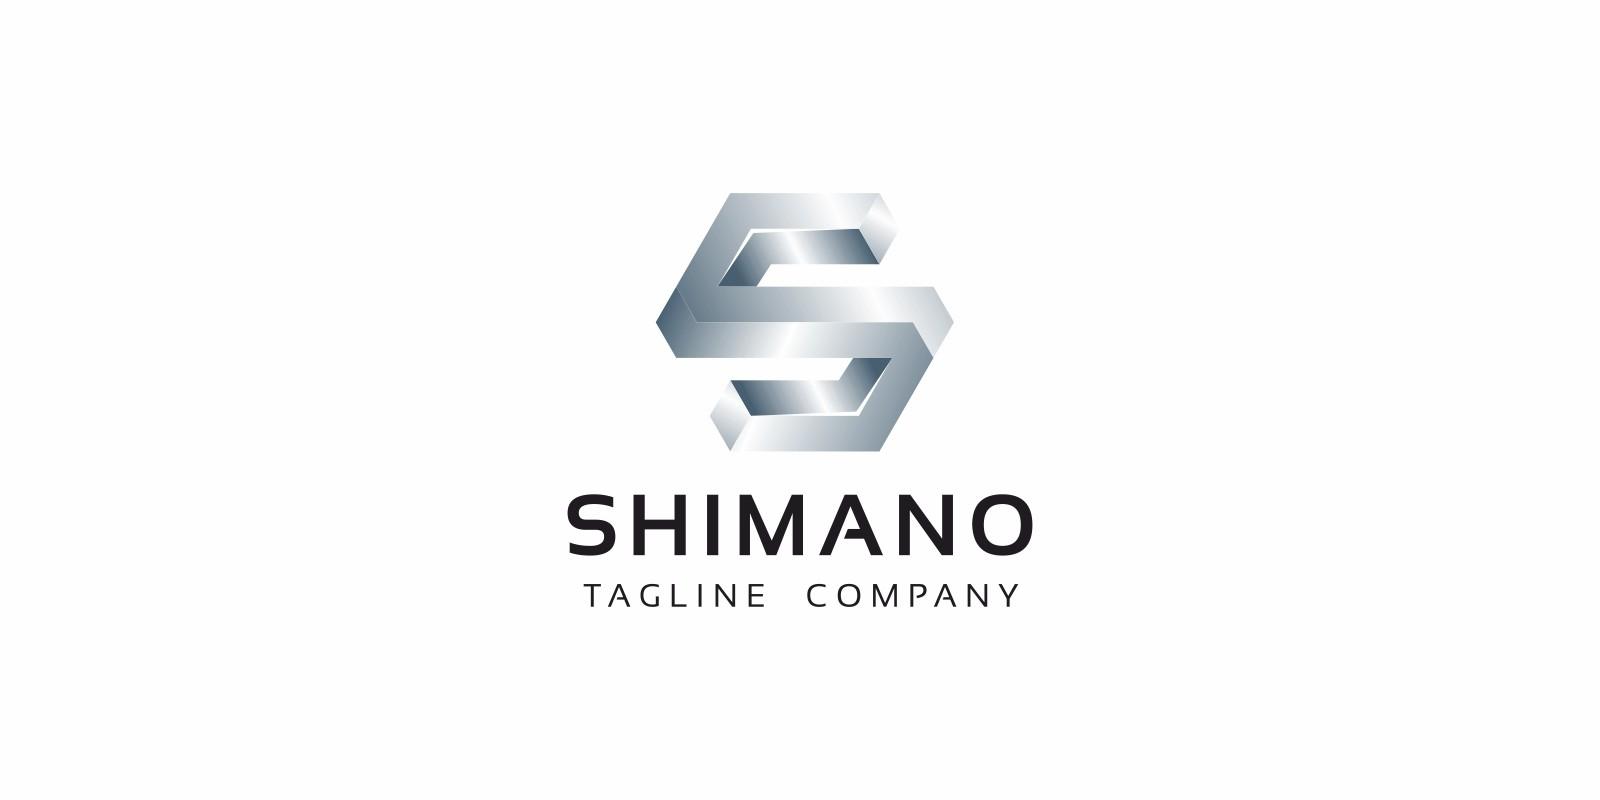 Shimano S Letter Logo